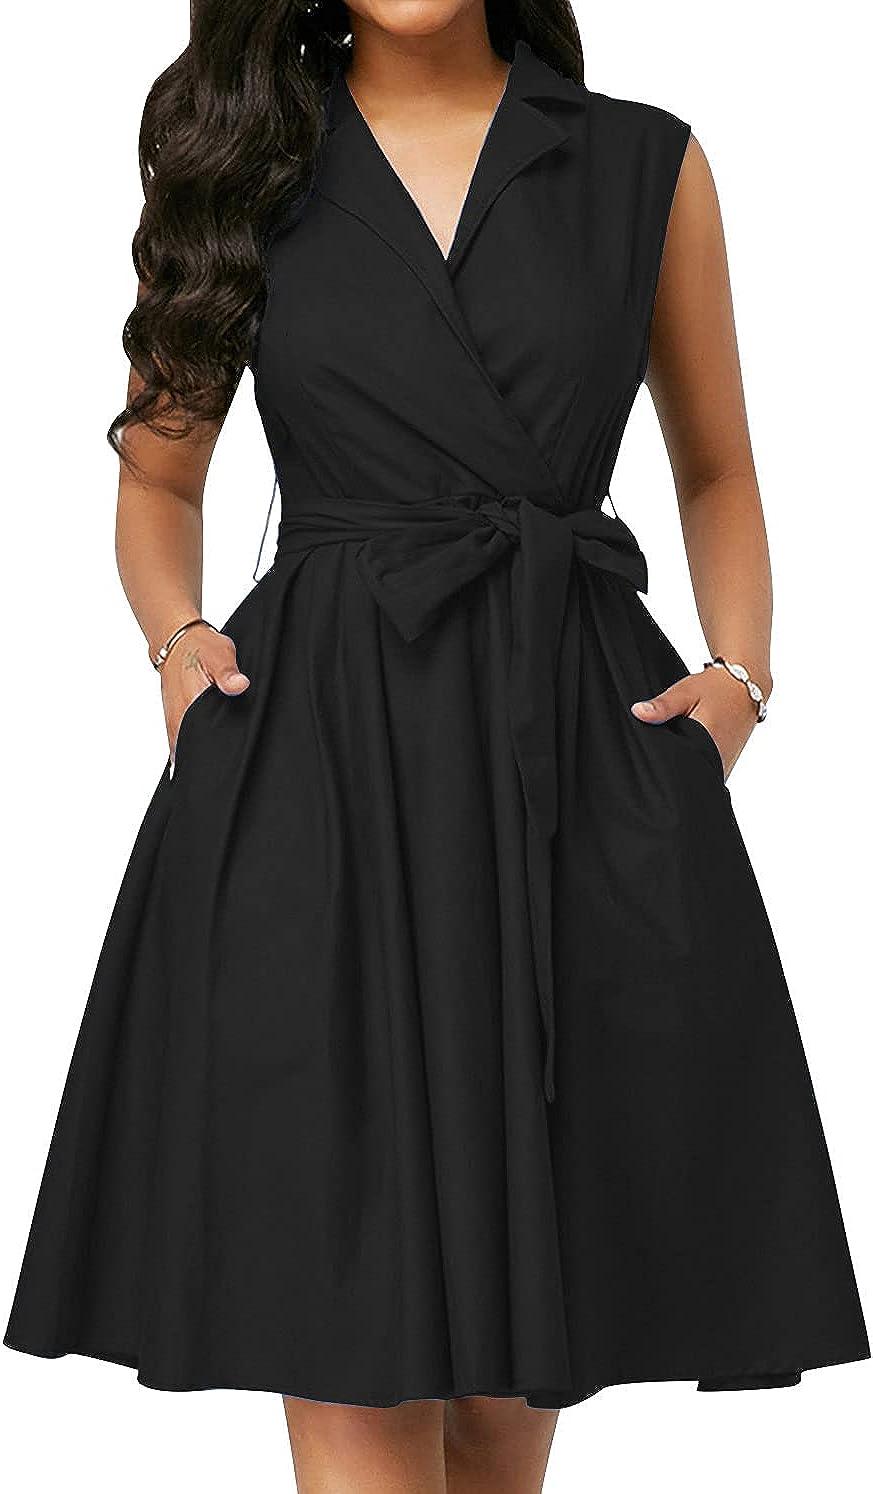 LunaJany Women's Casual Sleeveless Shirt Wrap Dress with Pockets